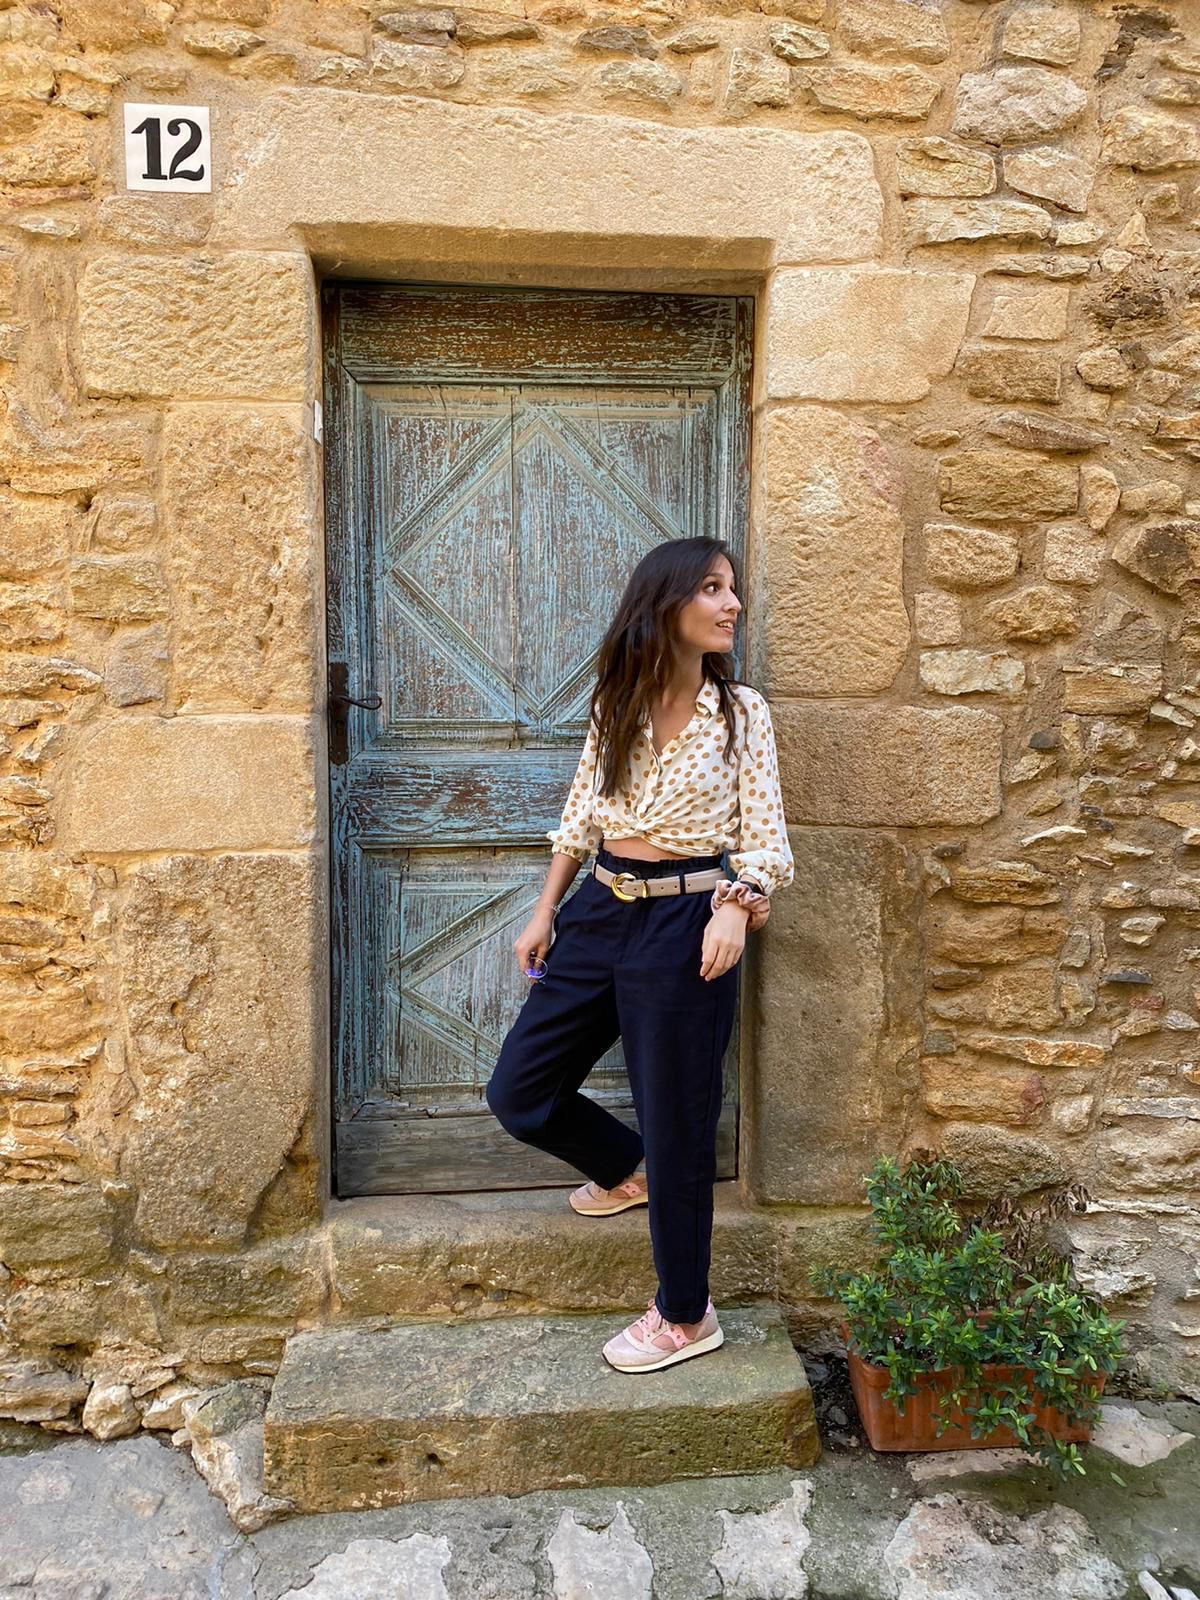 Sandra Parra «El éxito de los youtuber es la cercania que dan»